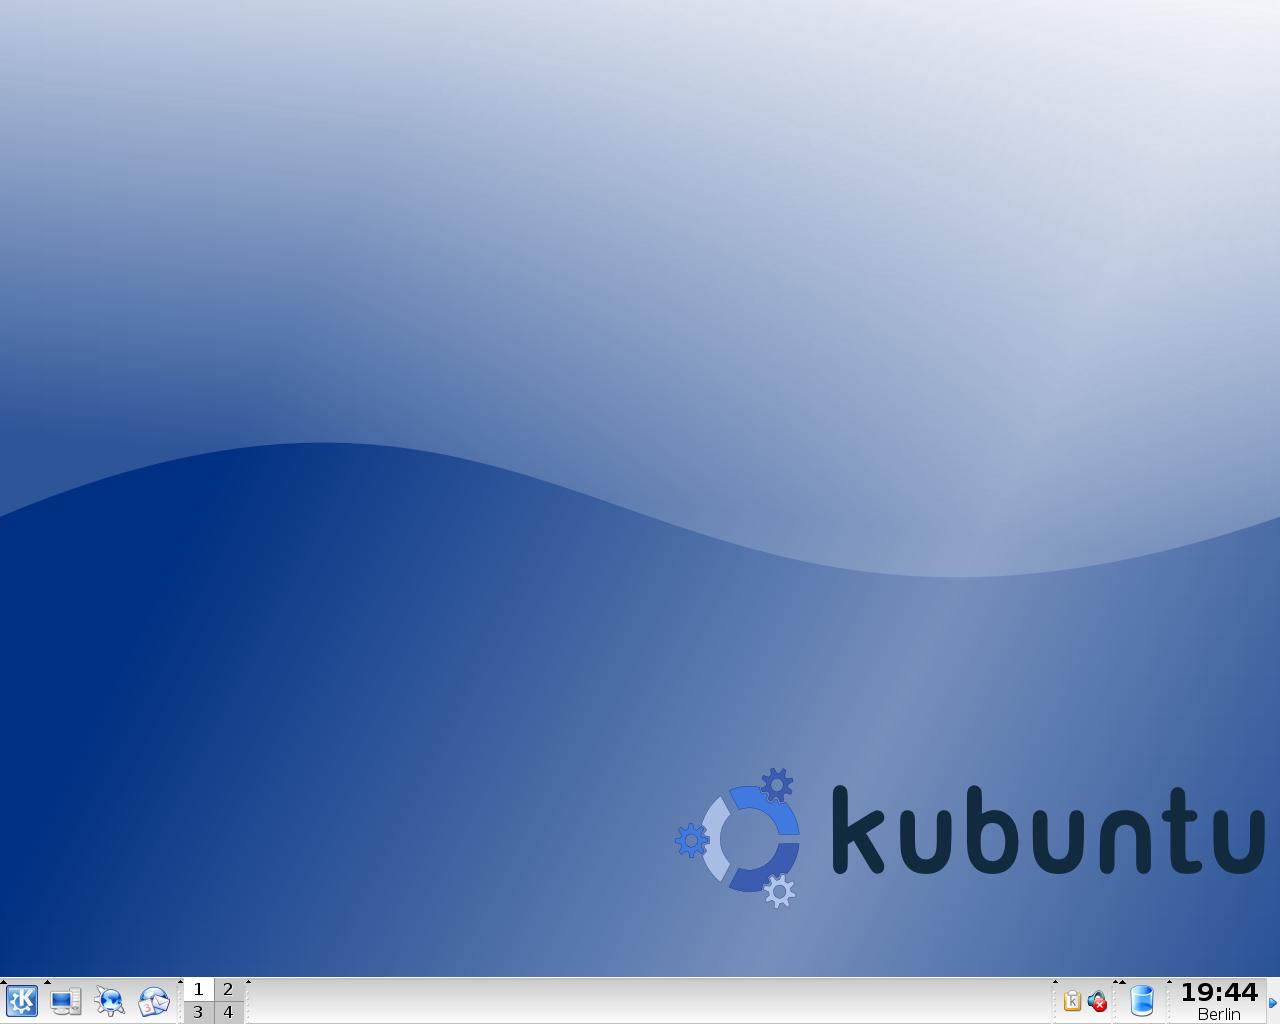 Kubuntu 5.04 (Hoary Hedgehog)